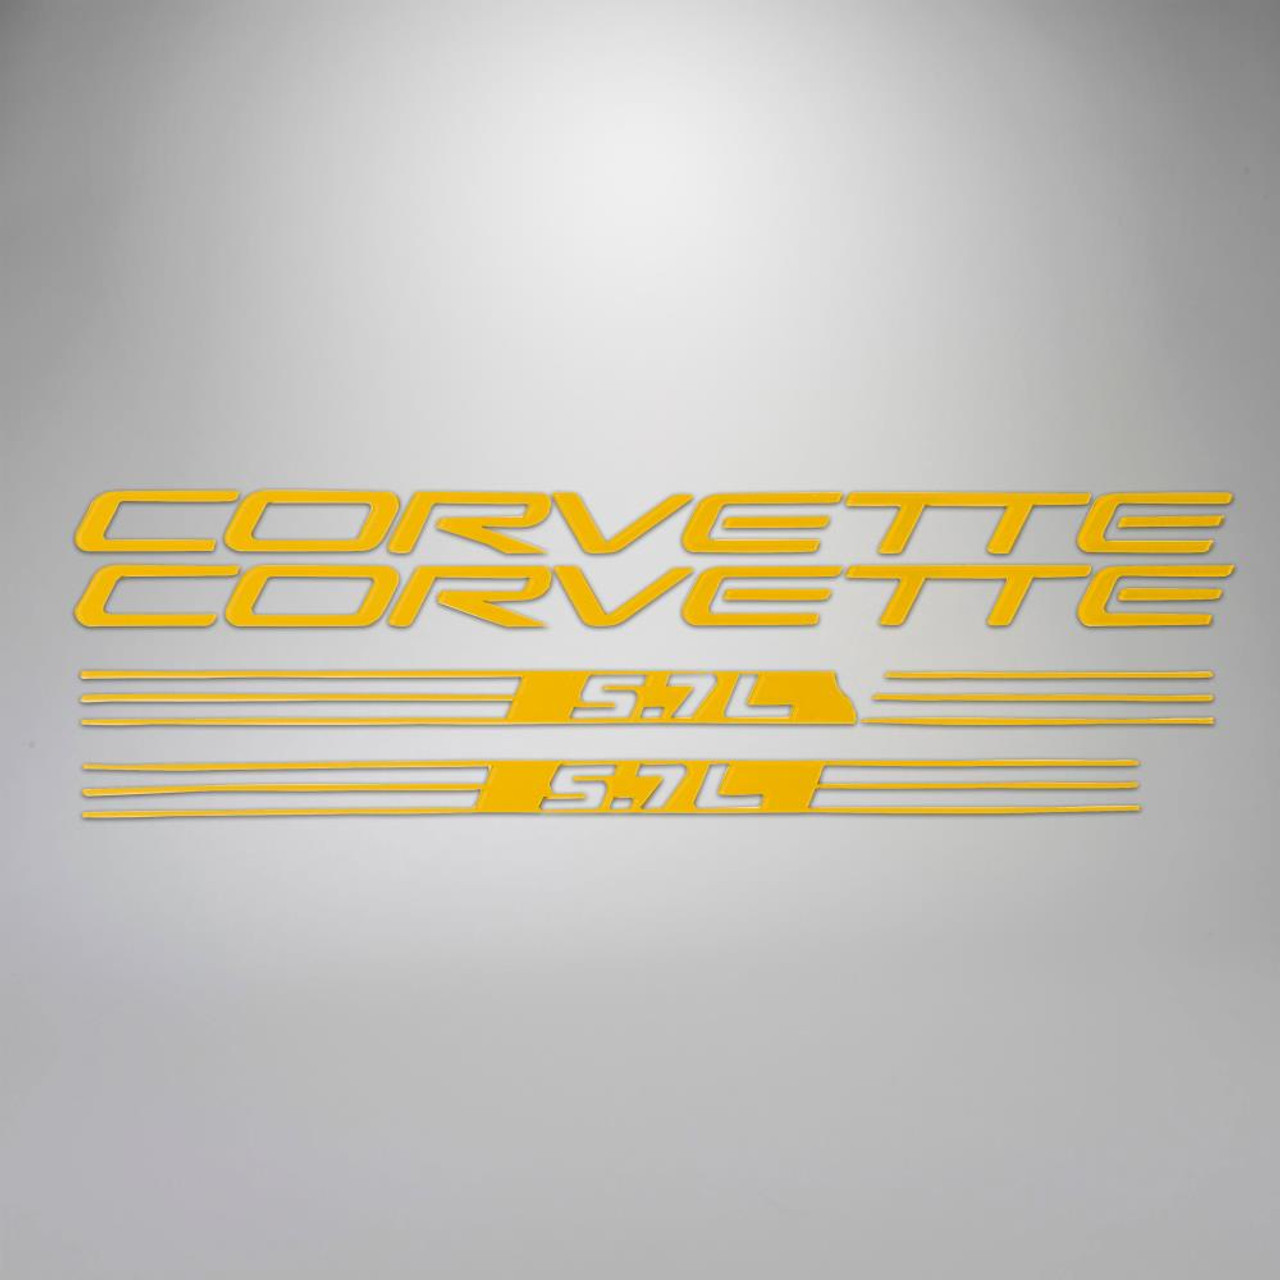 C5 99-04 Corvette 5.7L Fuel Rail Letter Kit - Yellow